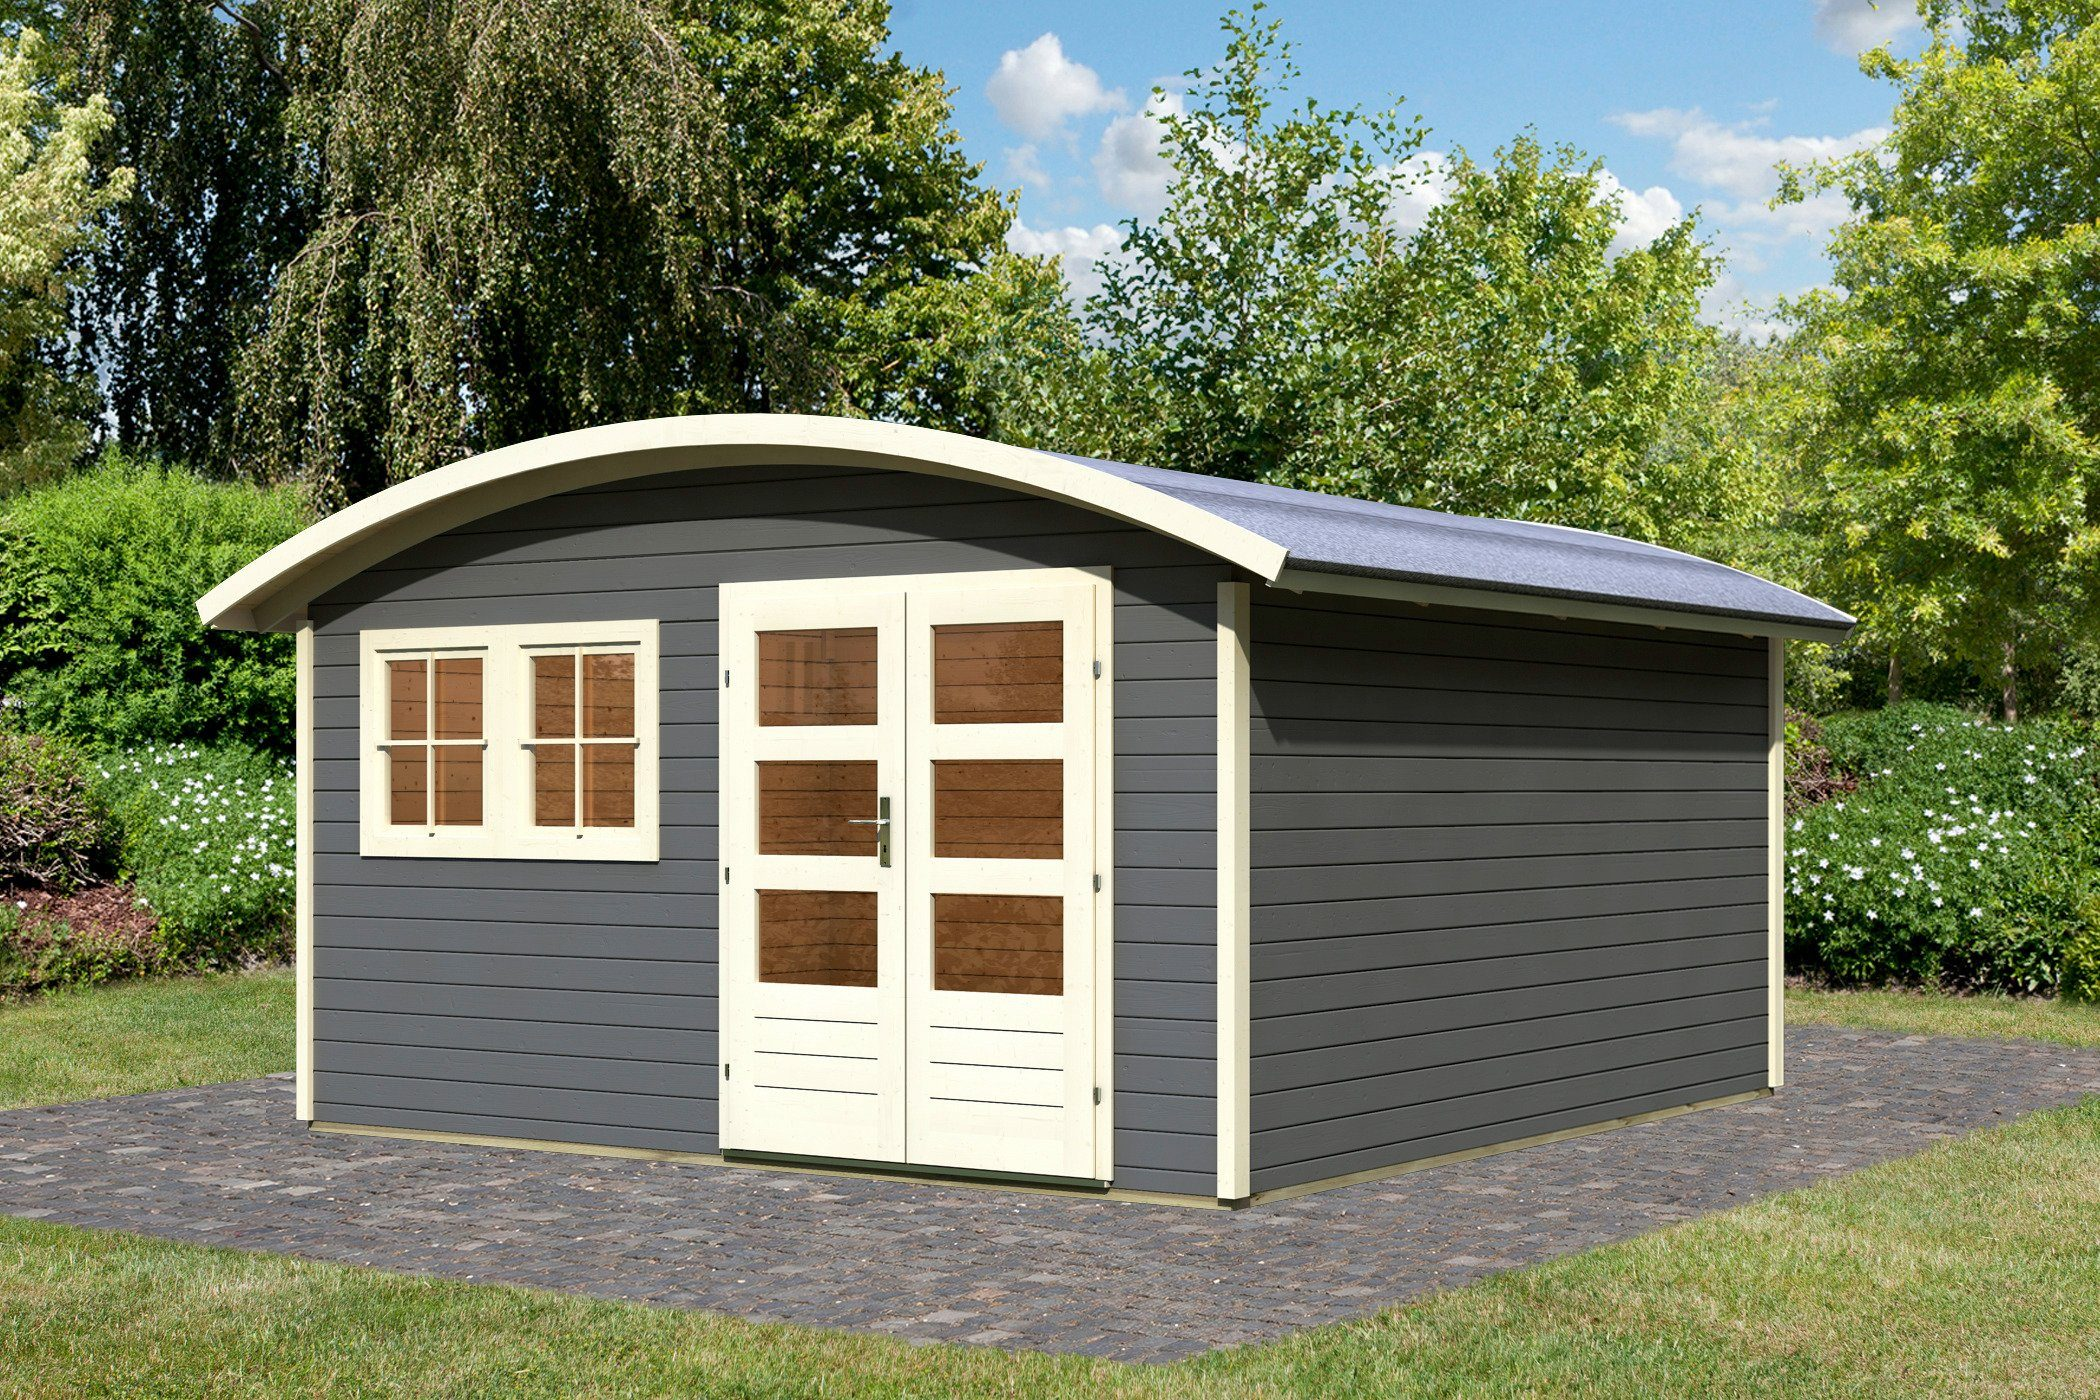 KARIBU Gartenhaus »Friedland 3«, BxT: 391x396 cm